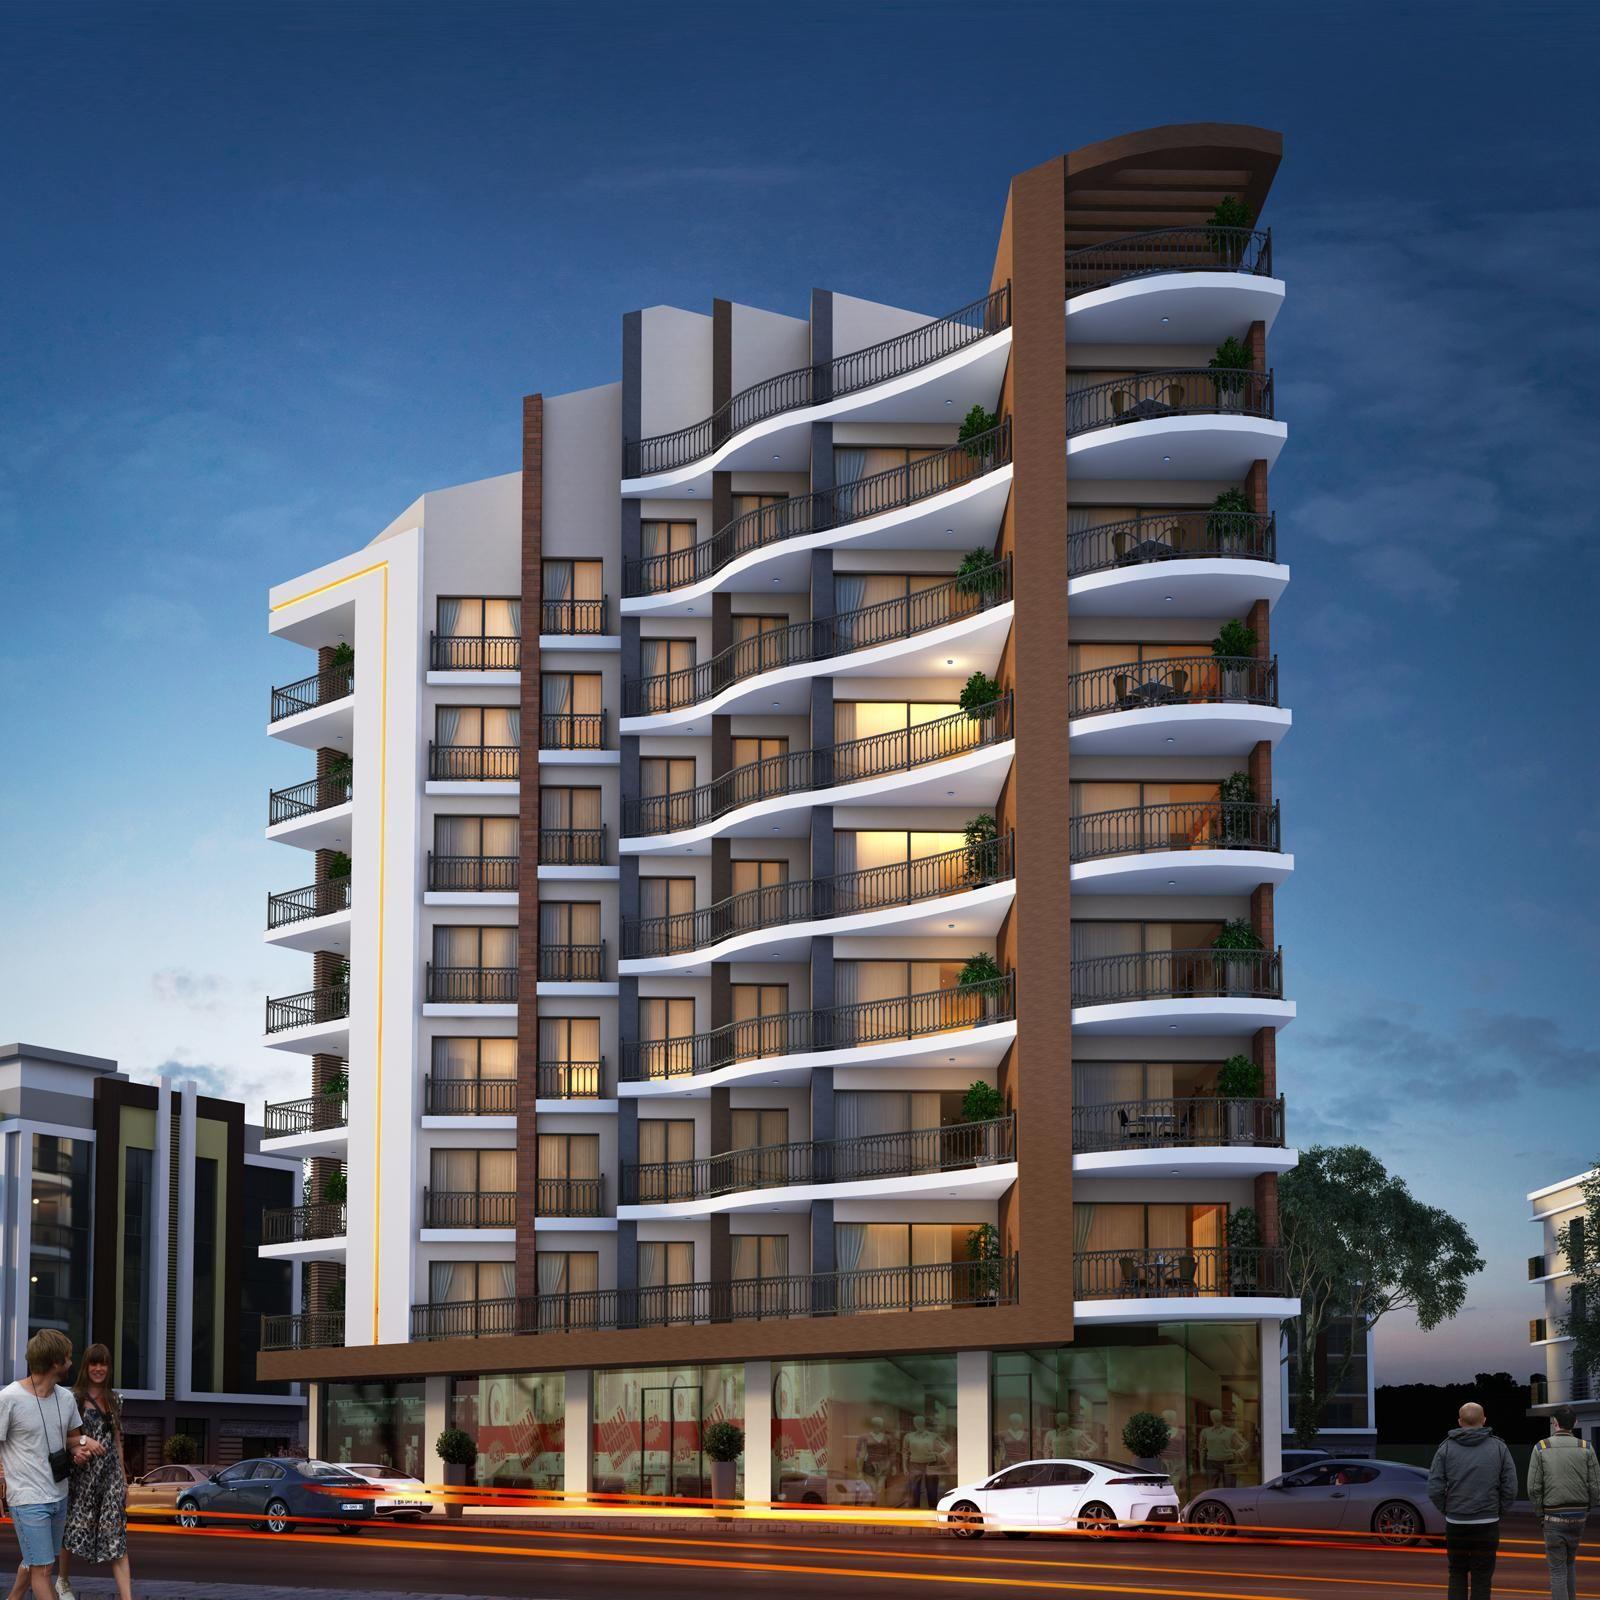 mimarlk mimari cephe tasarm 3d building design facade architecture architectural